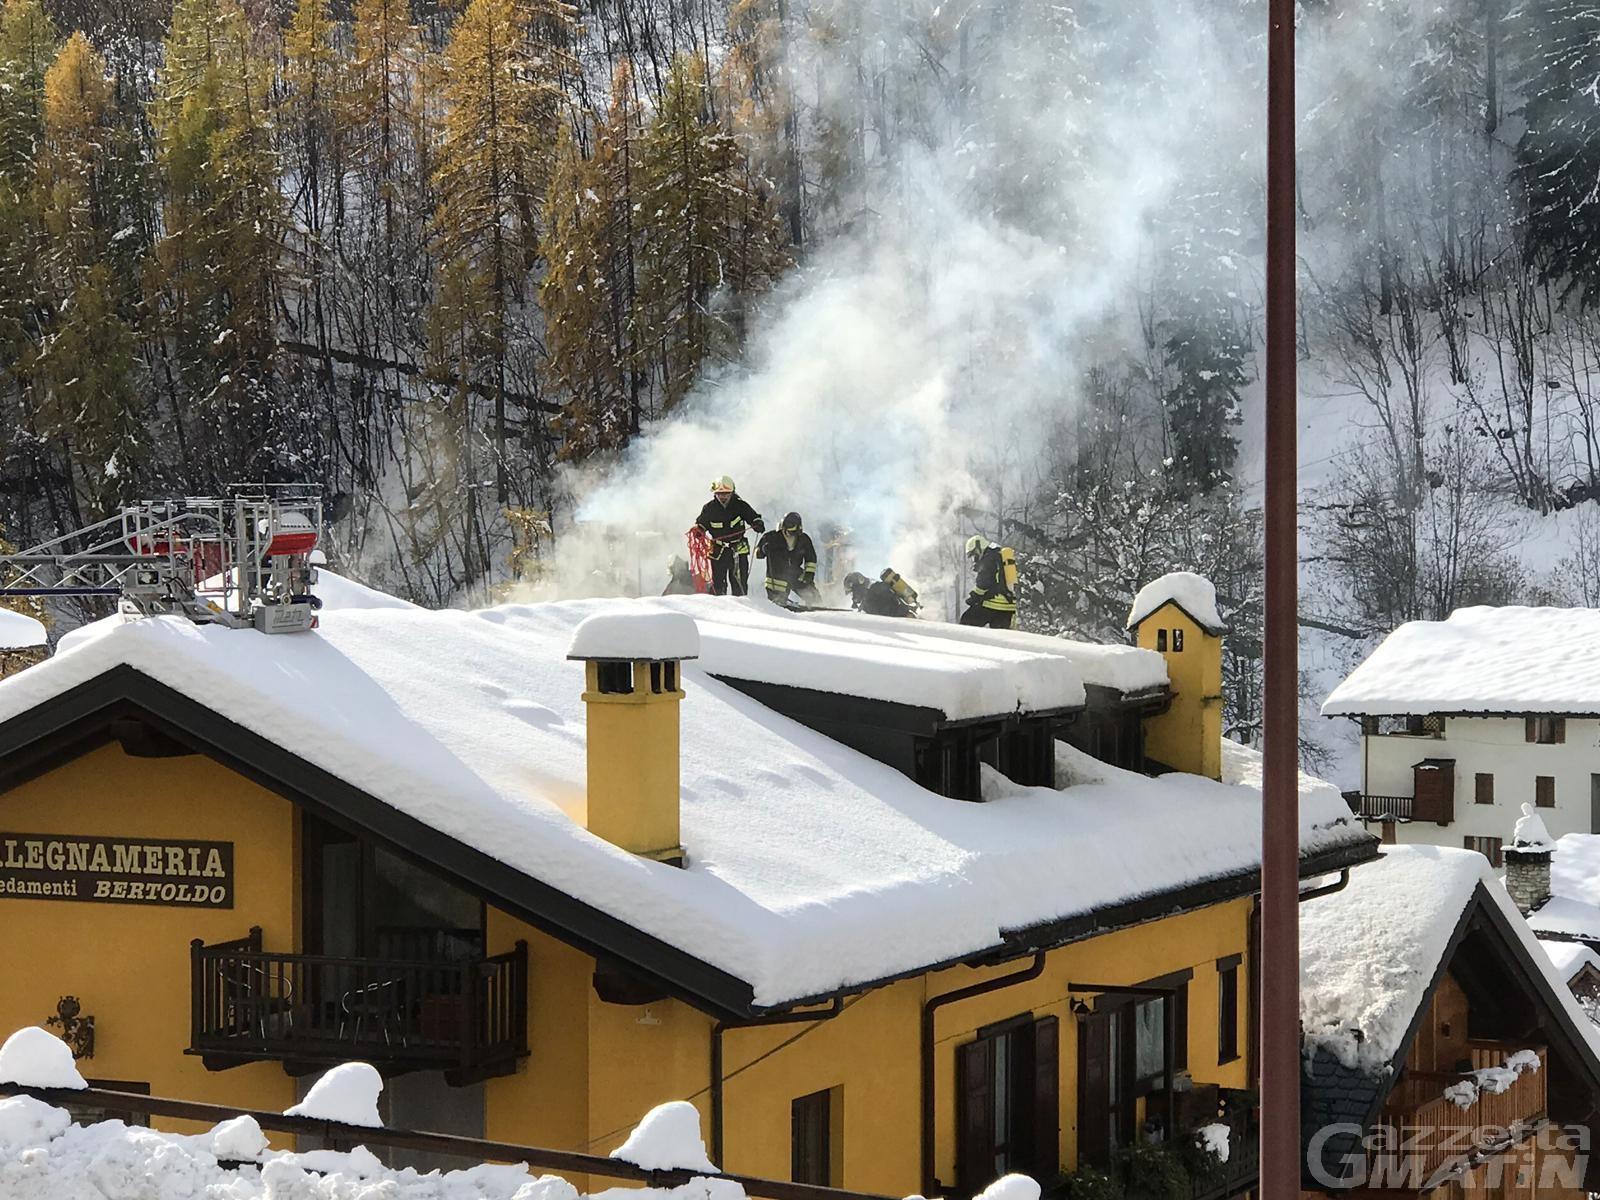 Incendio: fiamme nelle falegnamerie Duclos di Aosta e Bertoldo di Courmayeur